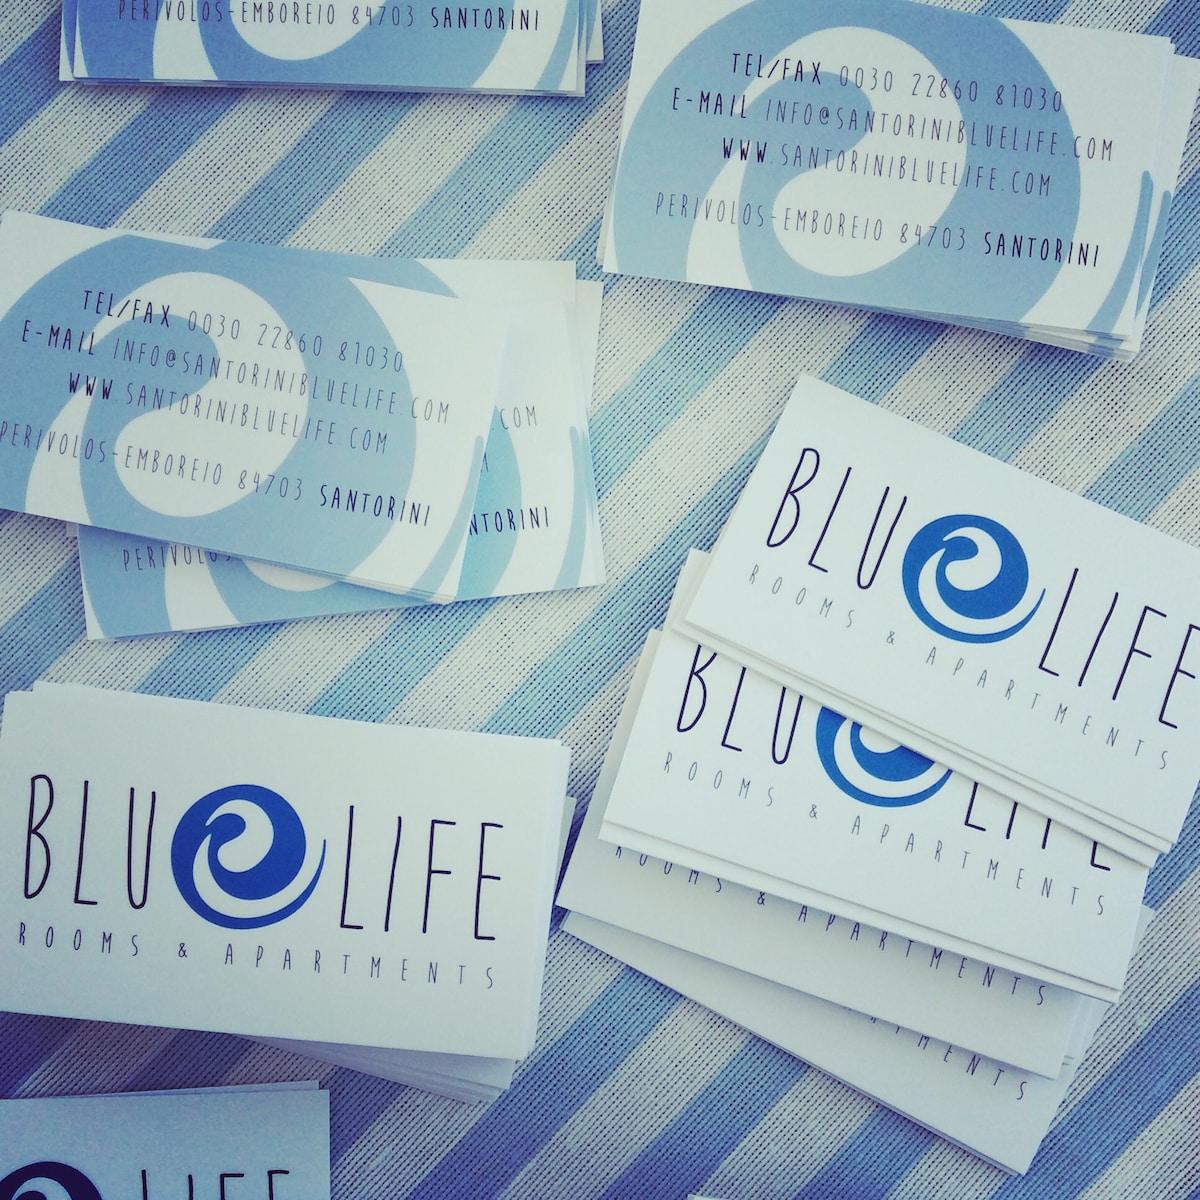 Bluelife from Santorini